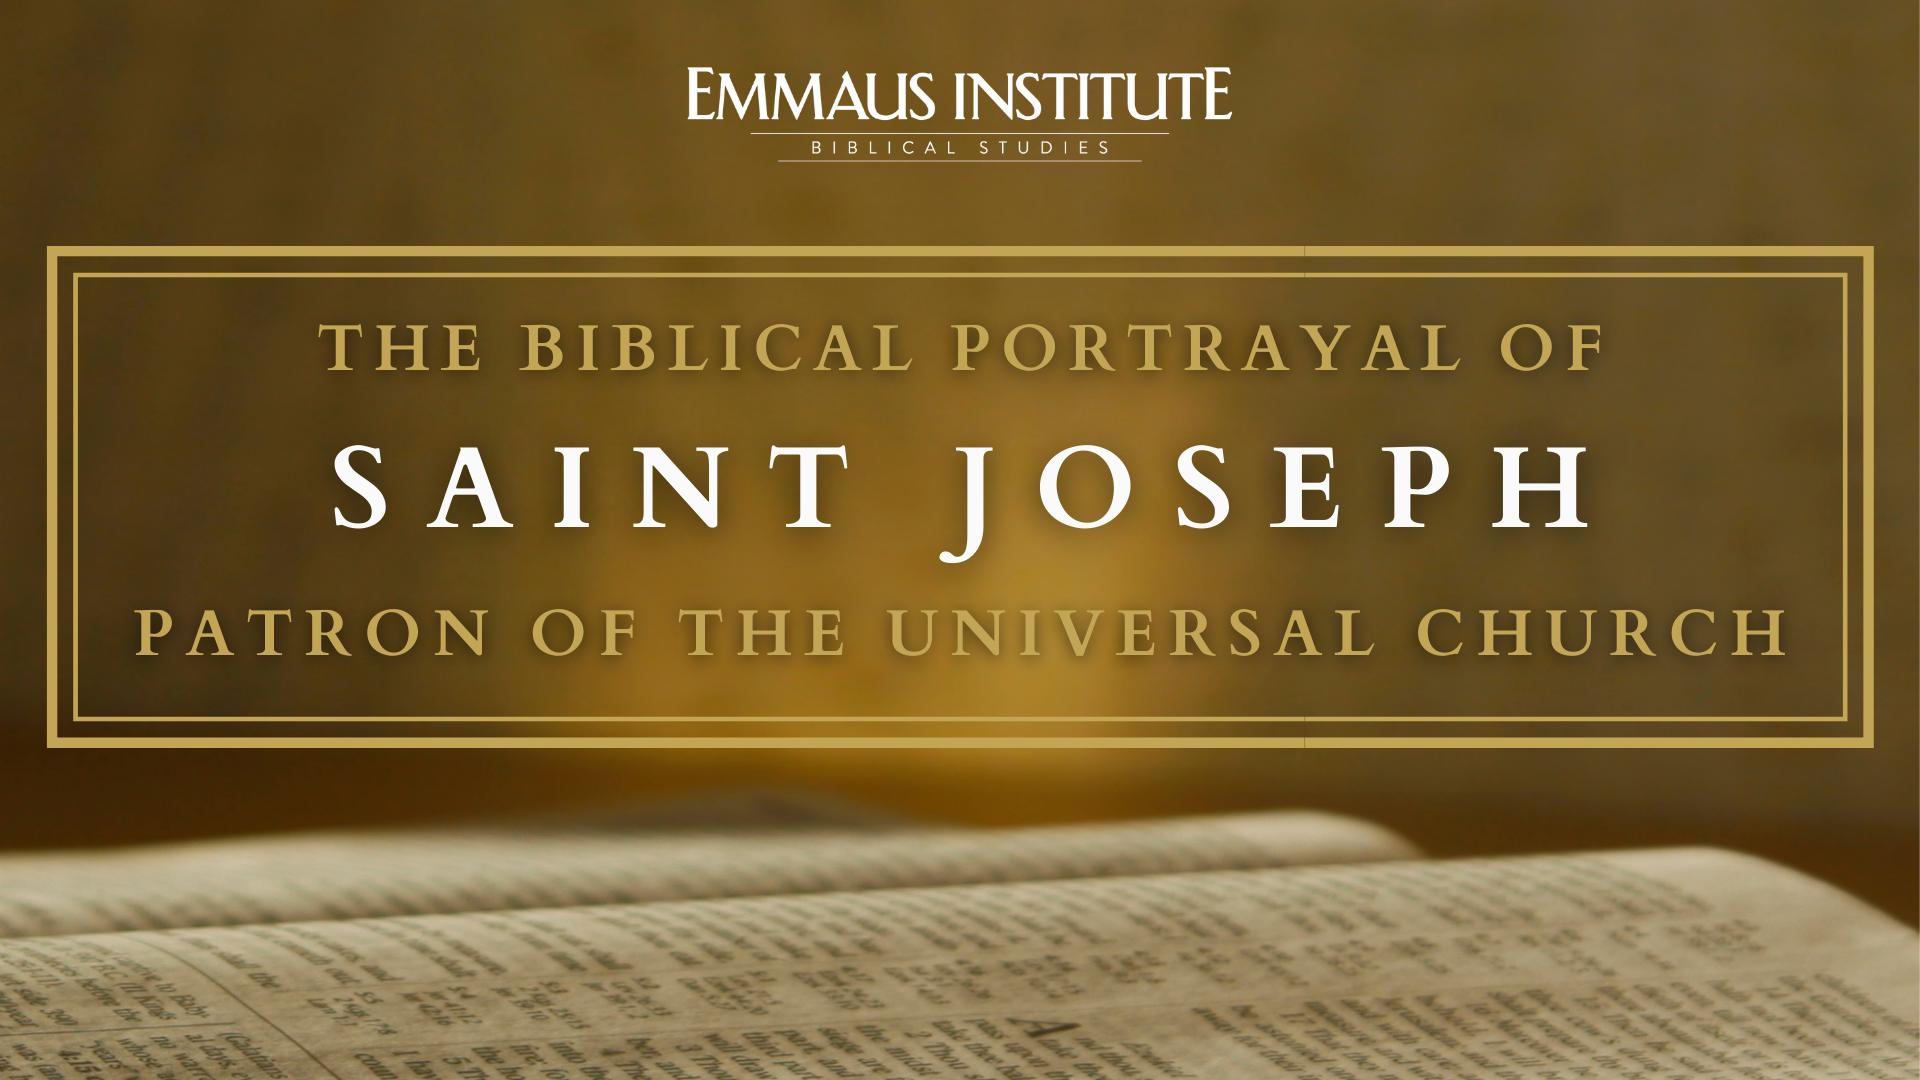 The Biblical Portrayal of Saint Joseph, Patron of the Universal Church